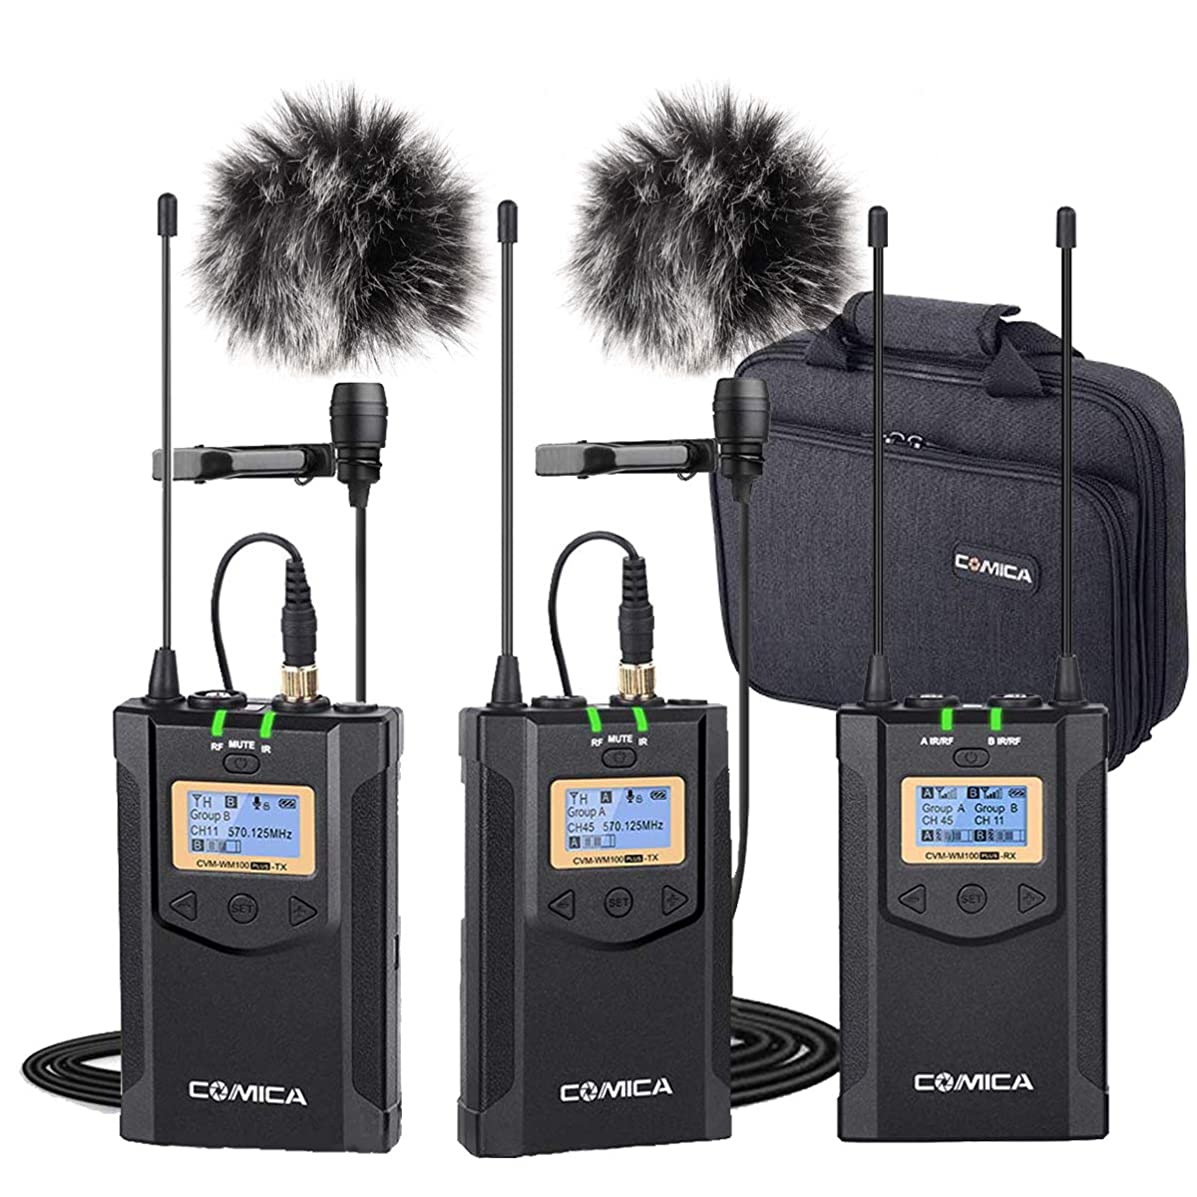 Wireless Microphones Comica CVM-WM100 PLUS Professional UHF Dual Wireless Lavalier Lapel Microphone System for Canon Nikon Sony Panasonic DSLR Cameras,XLR Camcorder,Smartphone etc.(2TX+1RX)